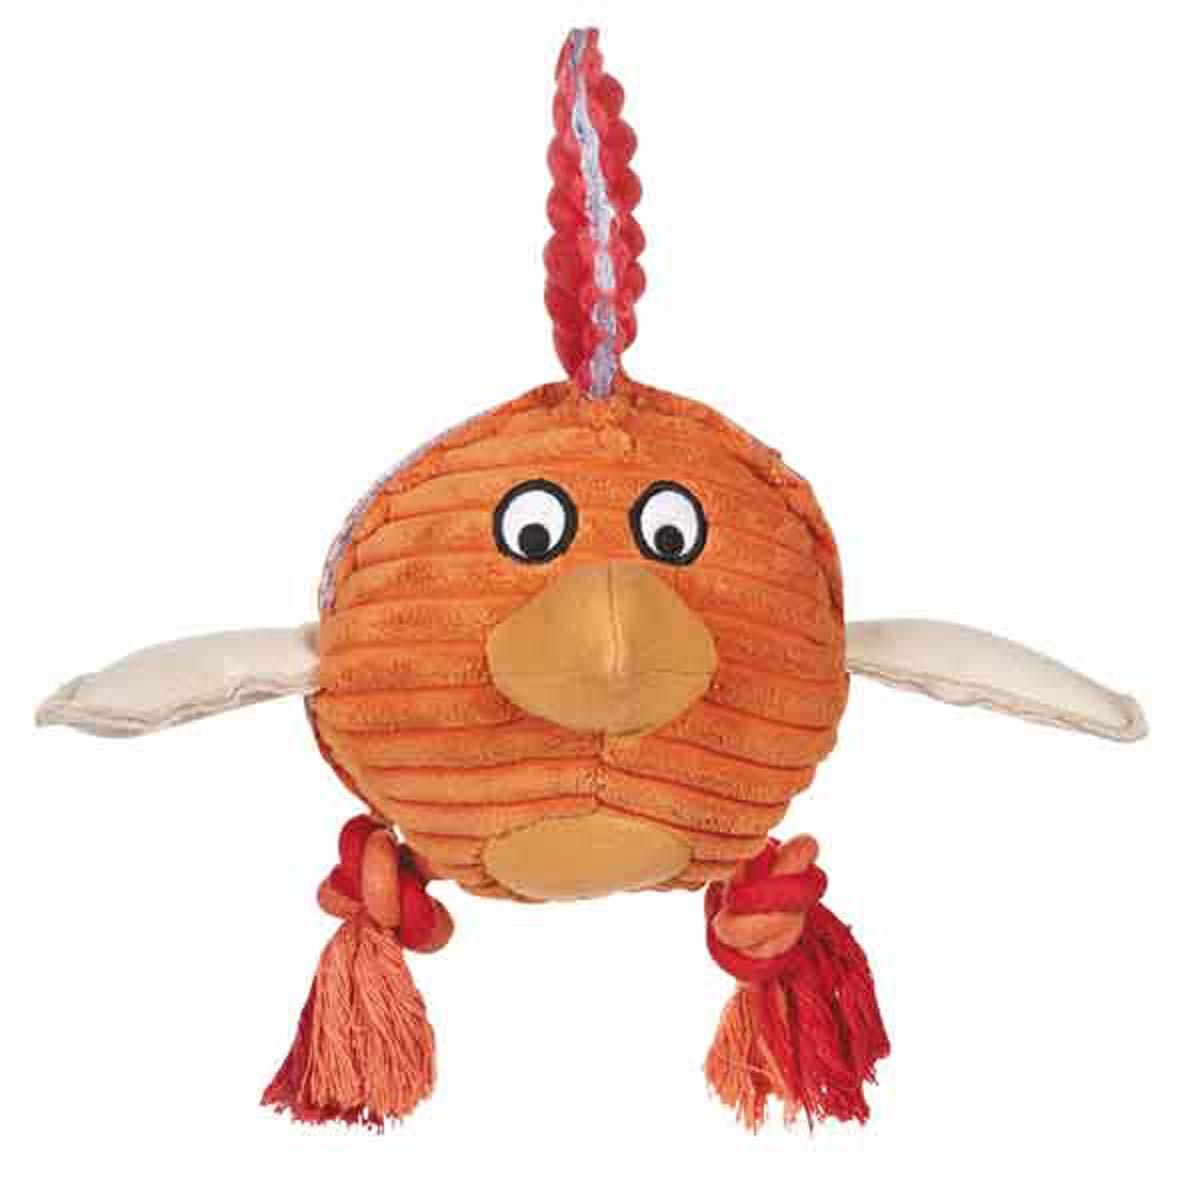 Grriggles Free-Range Friend Dog Toy - Rooster